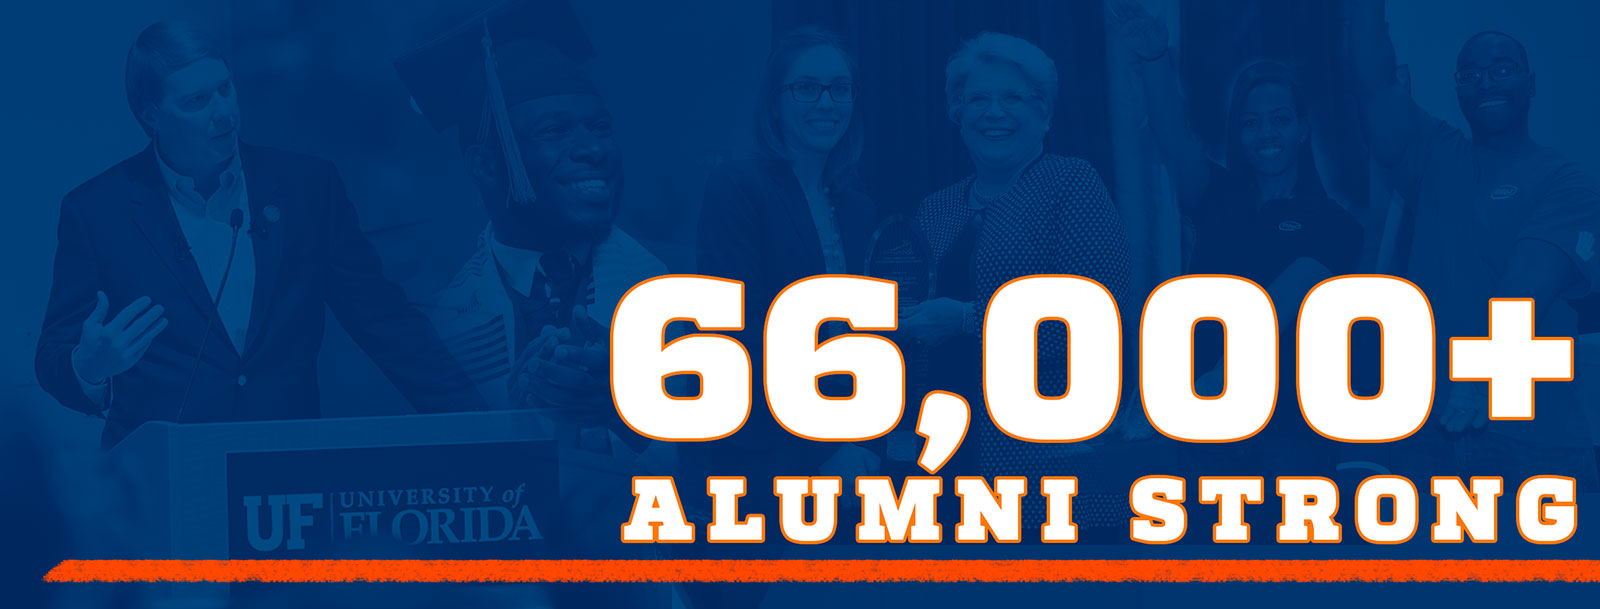 66,000+ Alumni Strong